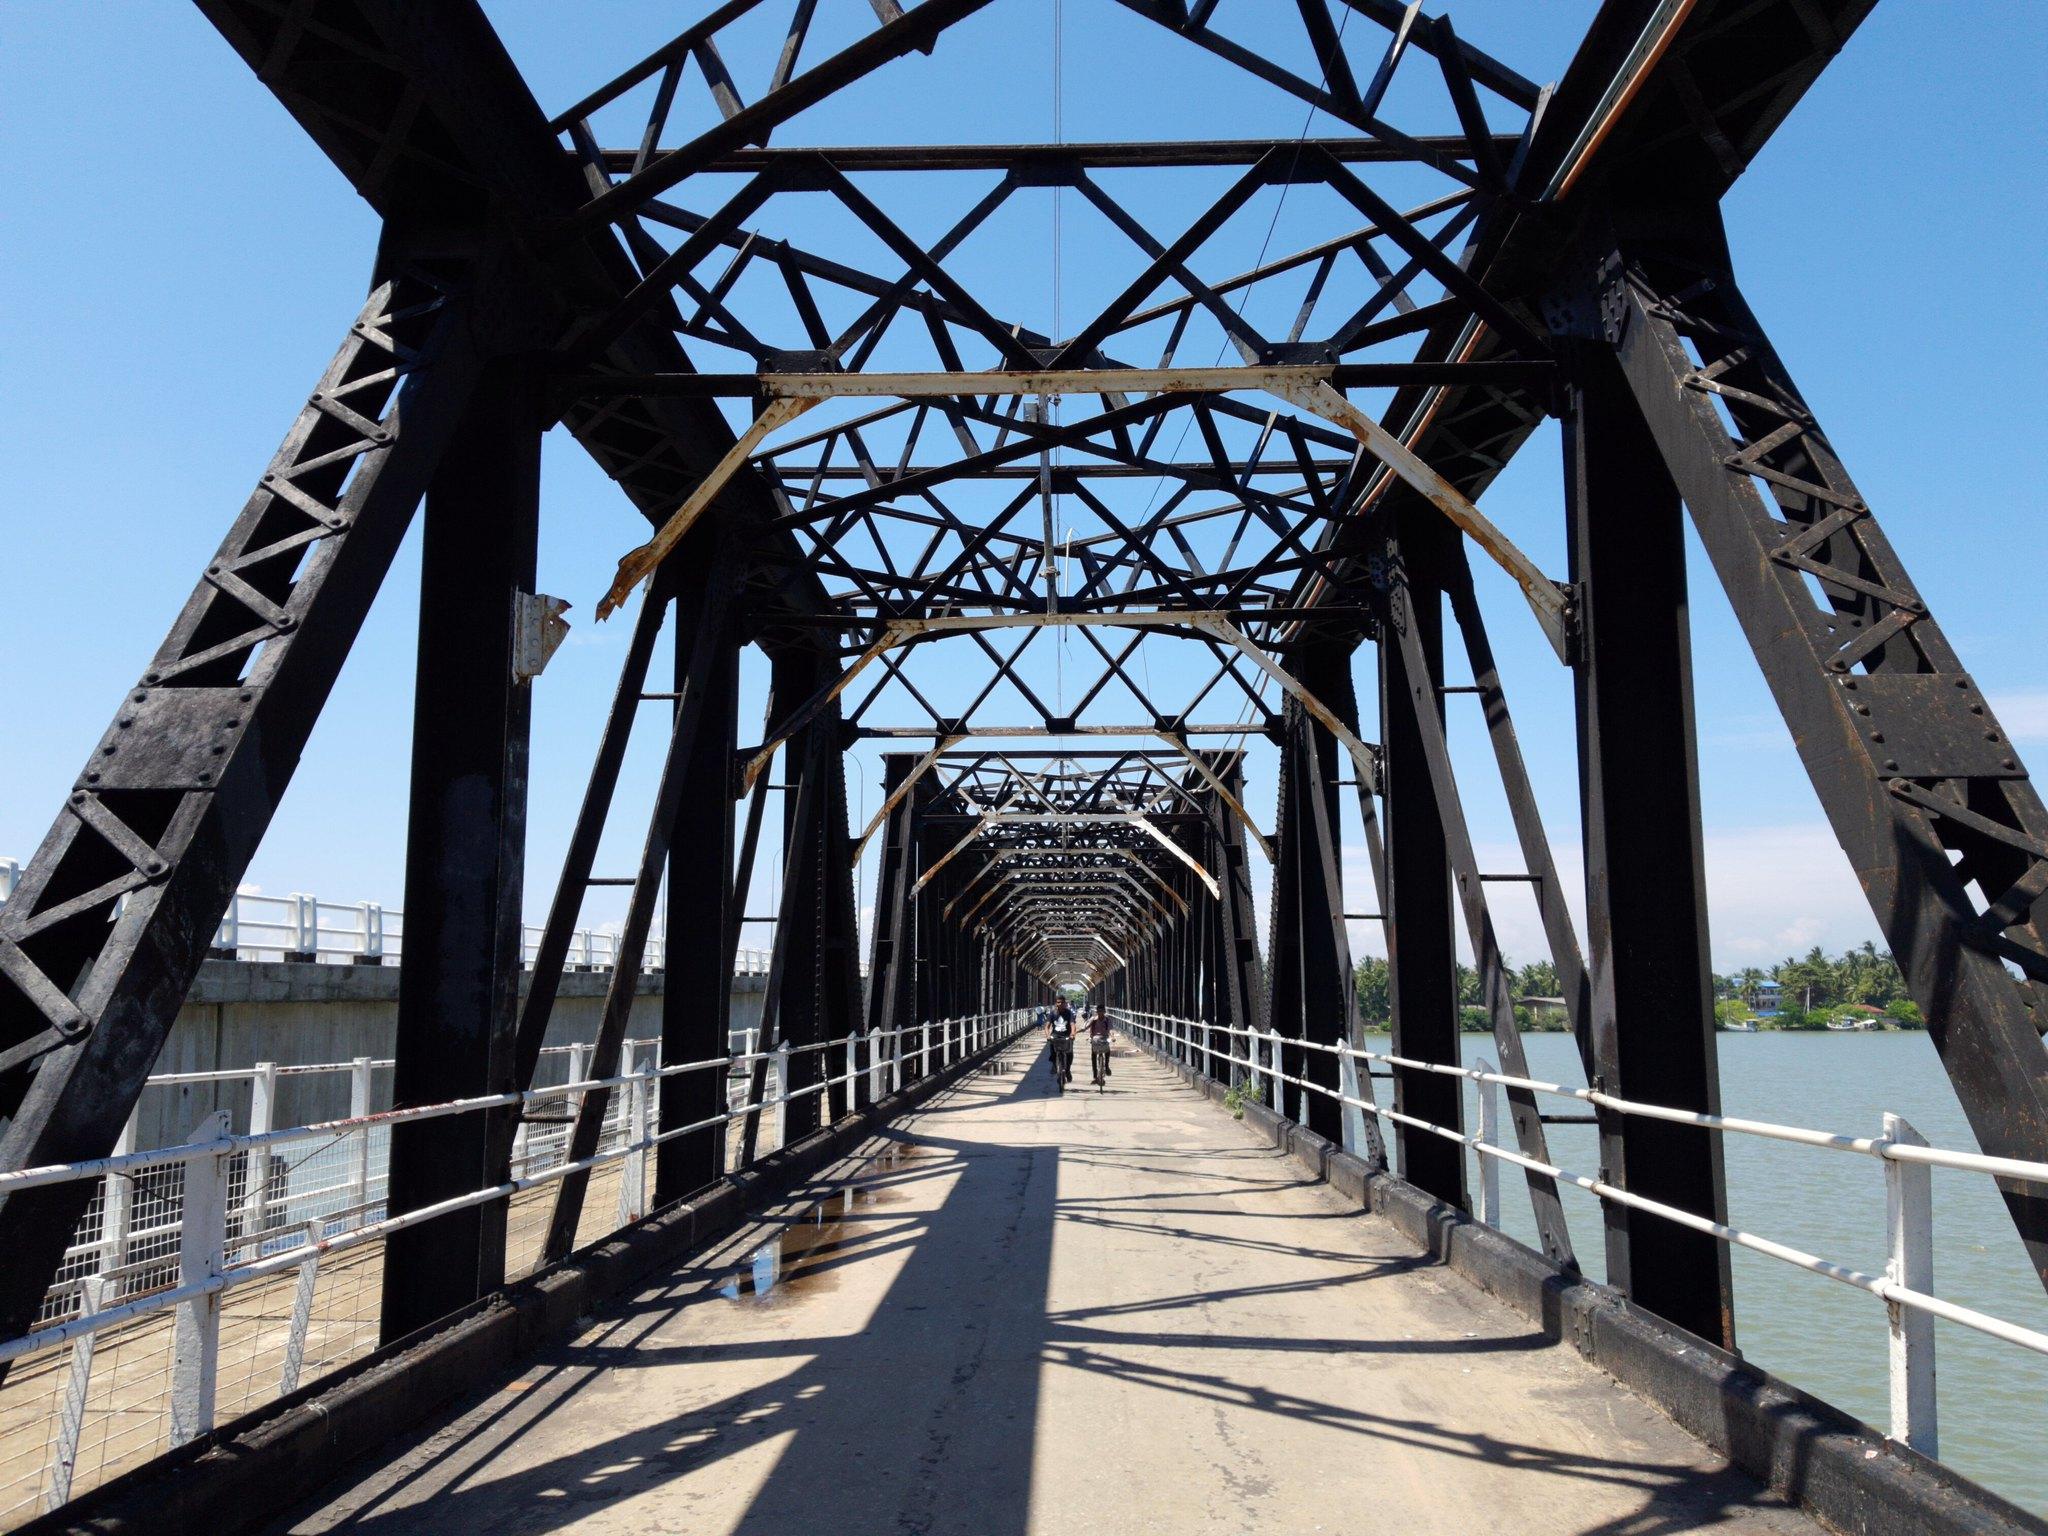 view along a historic steel bridge